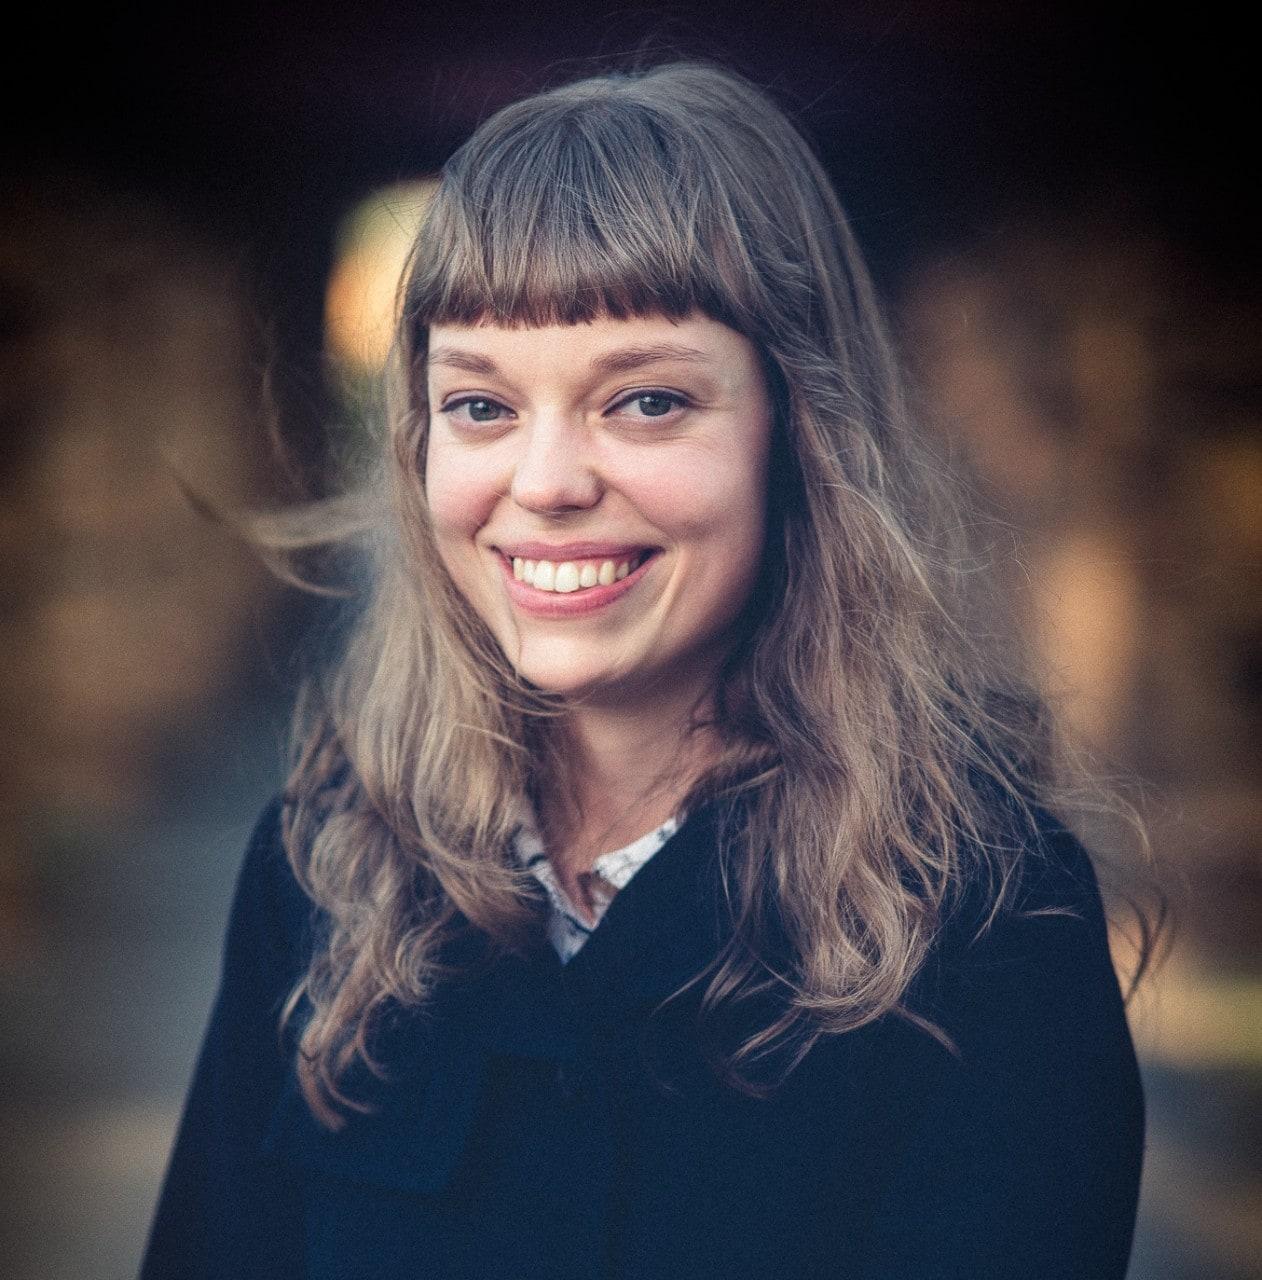 Communication on this topic: Amanda Stepto, holly-woodlawn/